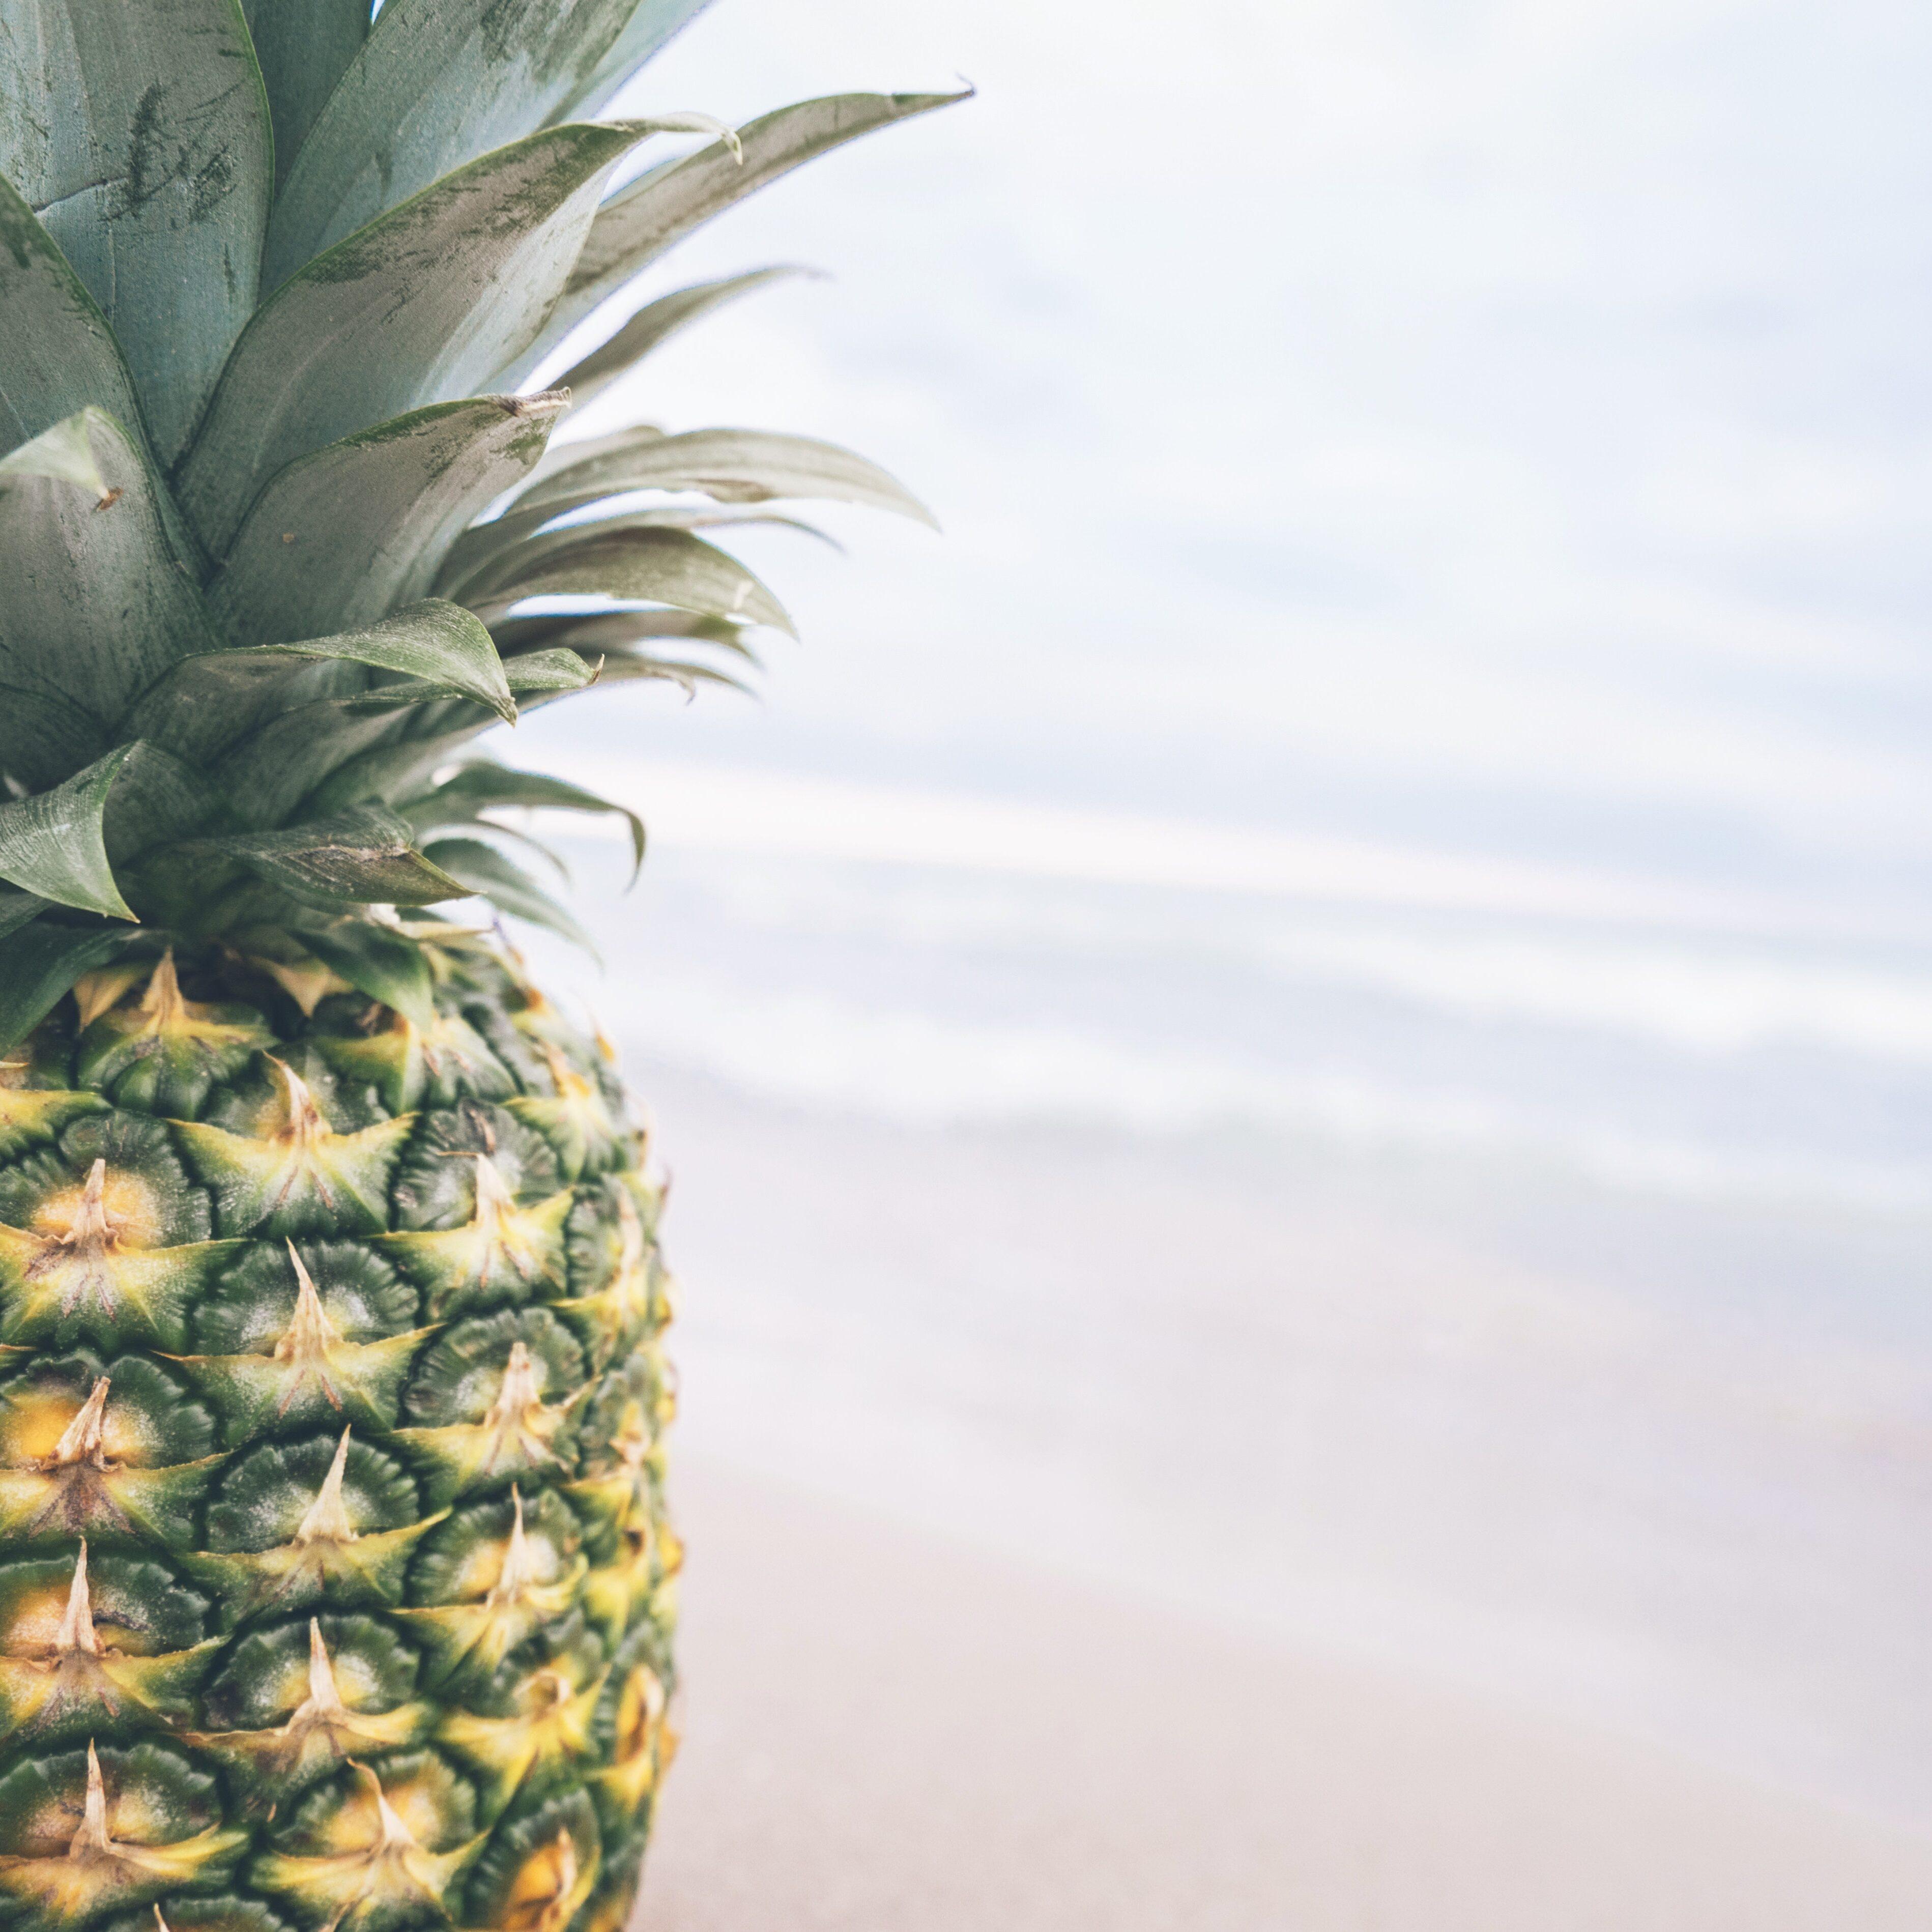 beach-food-fruit-137113